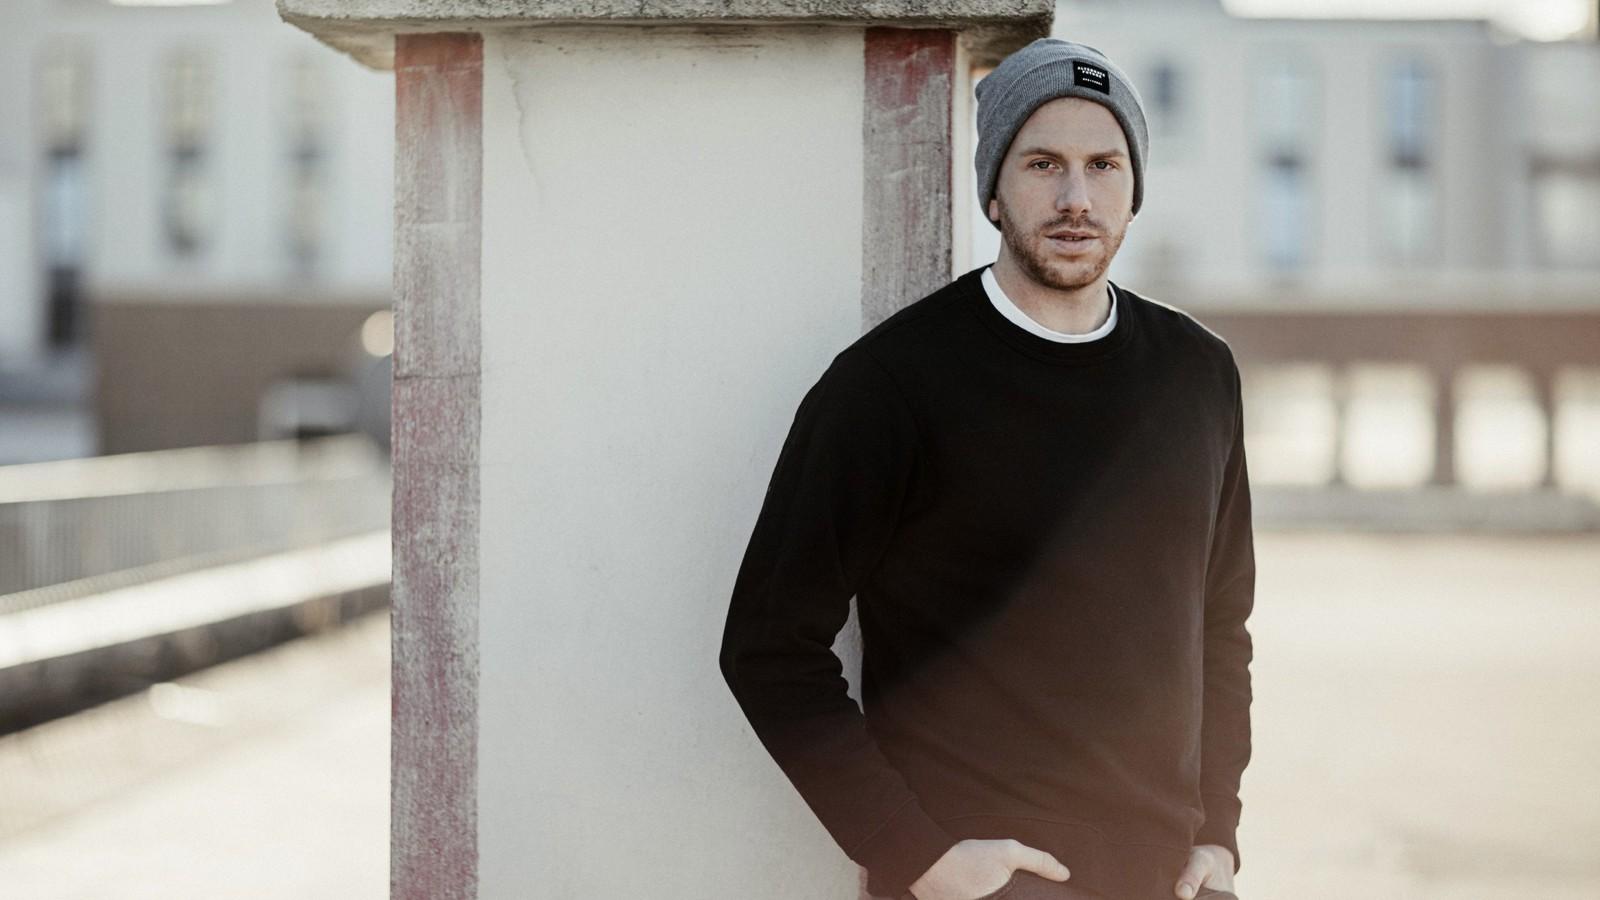 Dschungelshow-Kandidat Lars Tönsfeuerborn